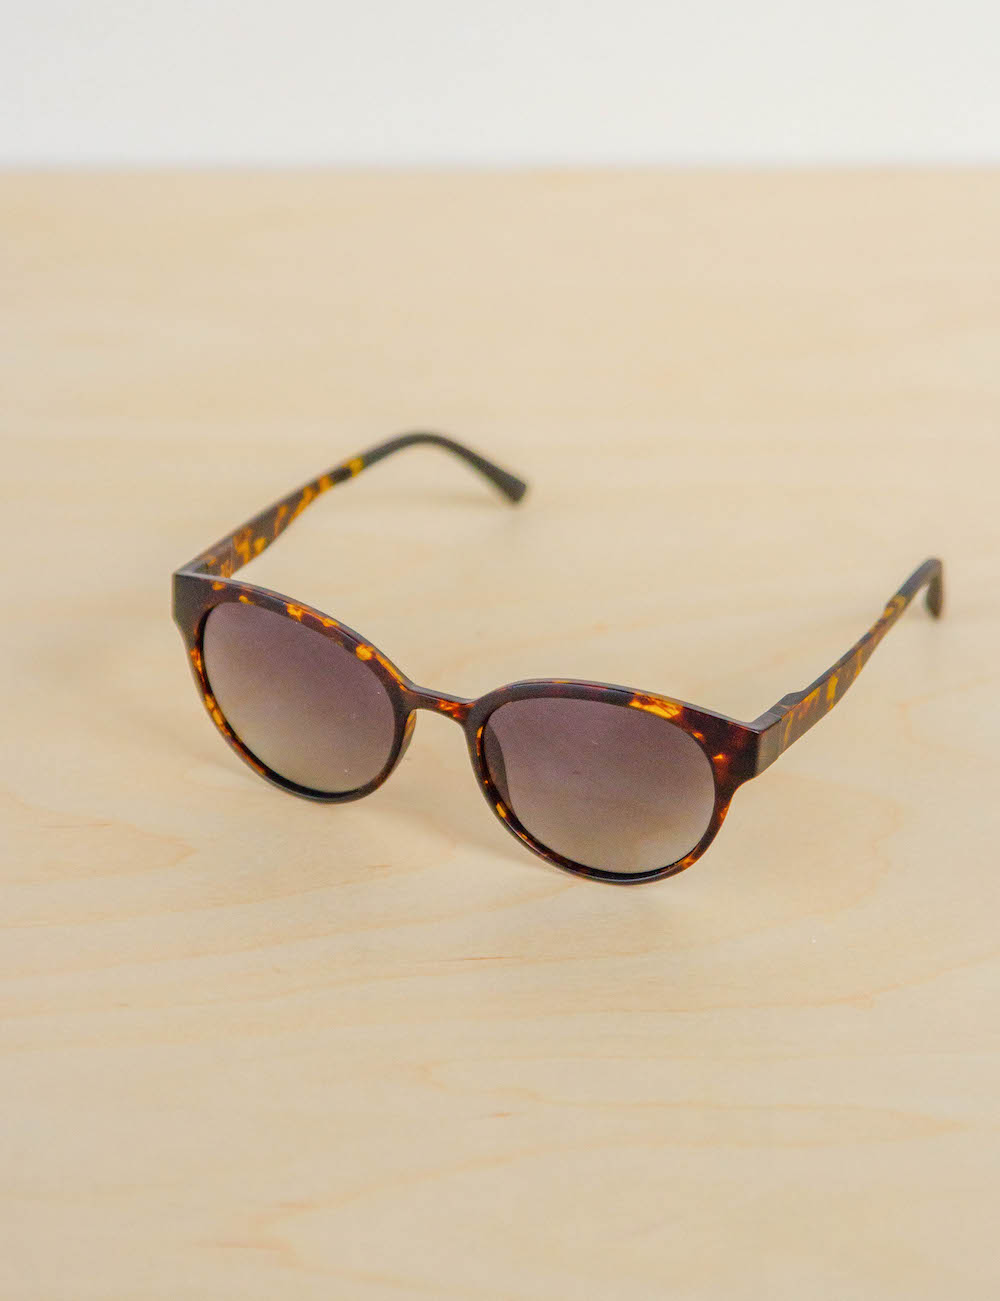 Modo Avala Tortoise Sunglasses look inside